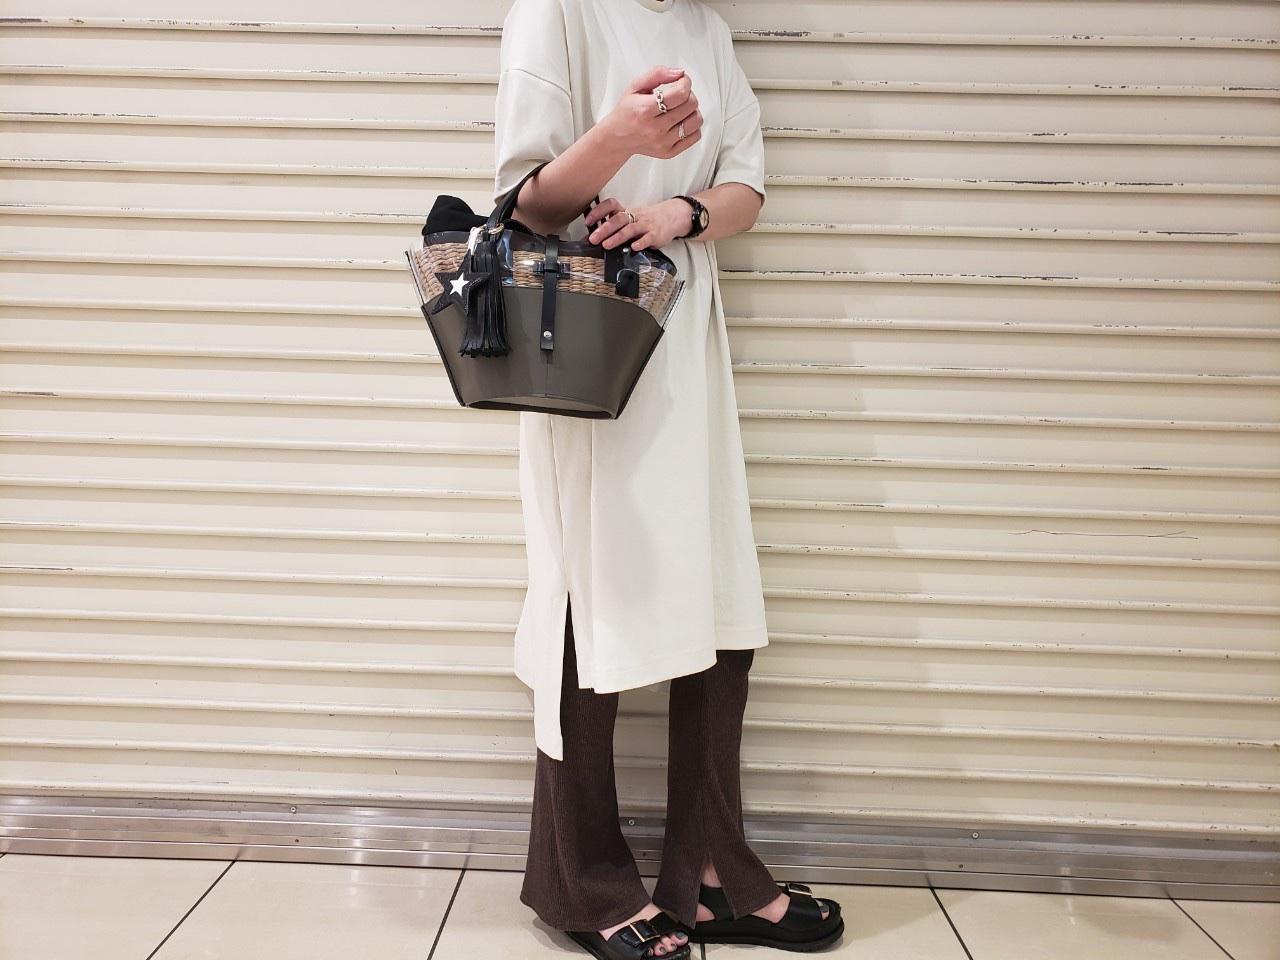 ikot イコットScrapBook スクラップブック bag バッグ basket bag カゴバッグ 牛革 ルミネ大宮 大宮ルミネ